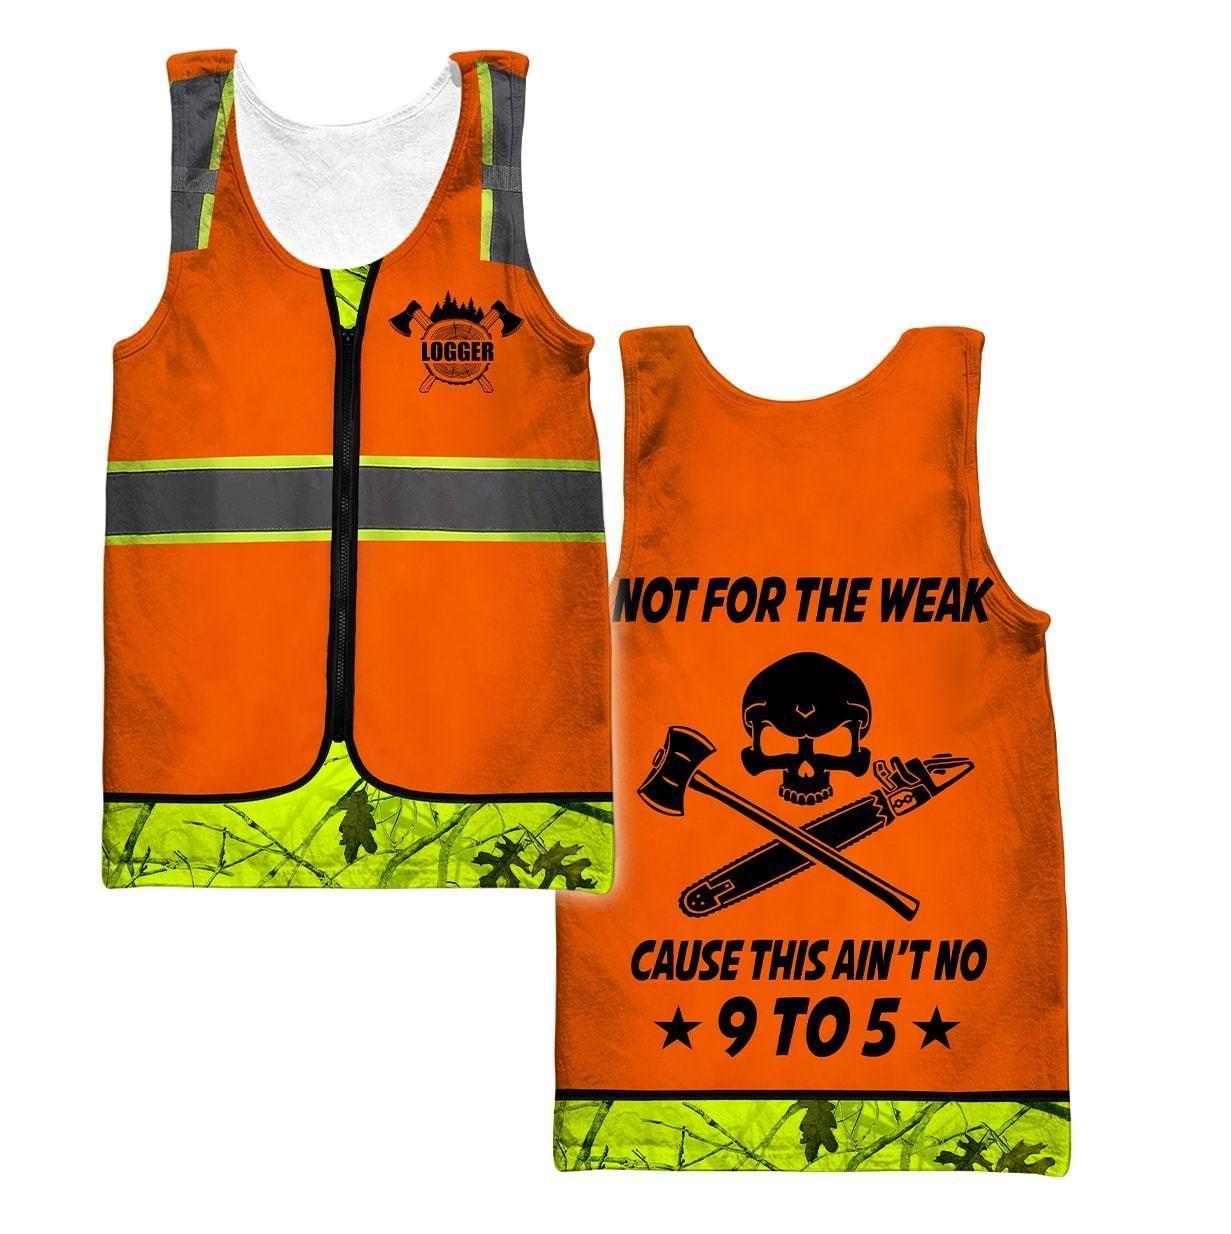 3D Chainsaw Logger Custom Name Unisex Shirts AM102055 - Men's tank top / 4XL